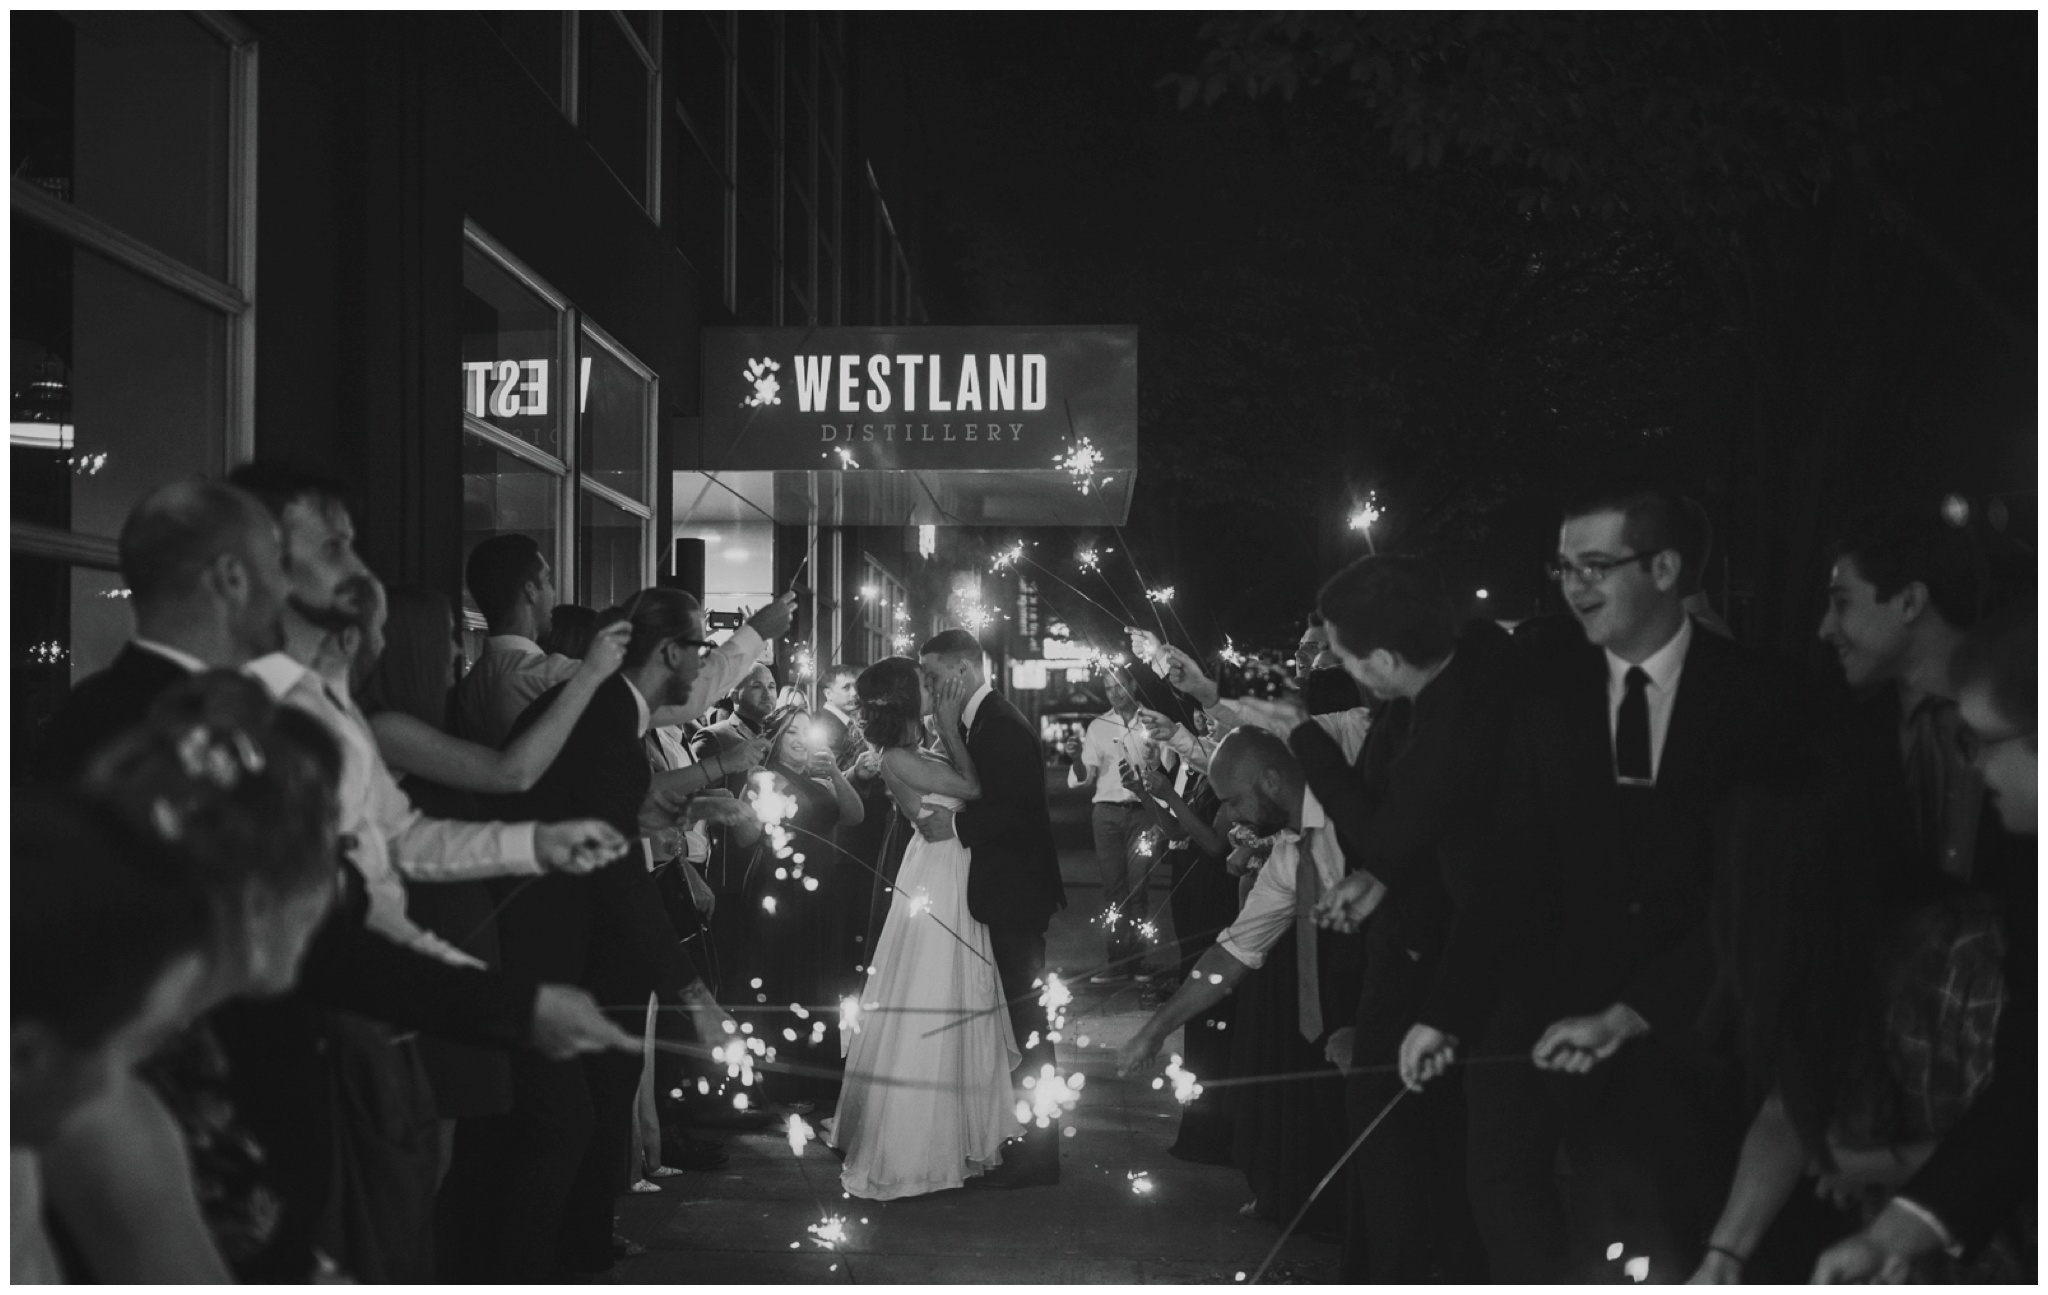 alyssa-keiran-westland-distillery-urban-seattle-wedding-photographer-caitlyn-nikula-175.jpg